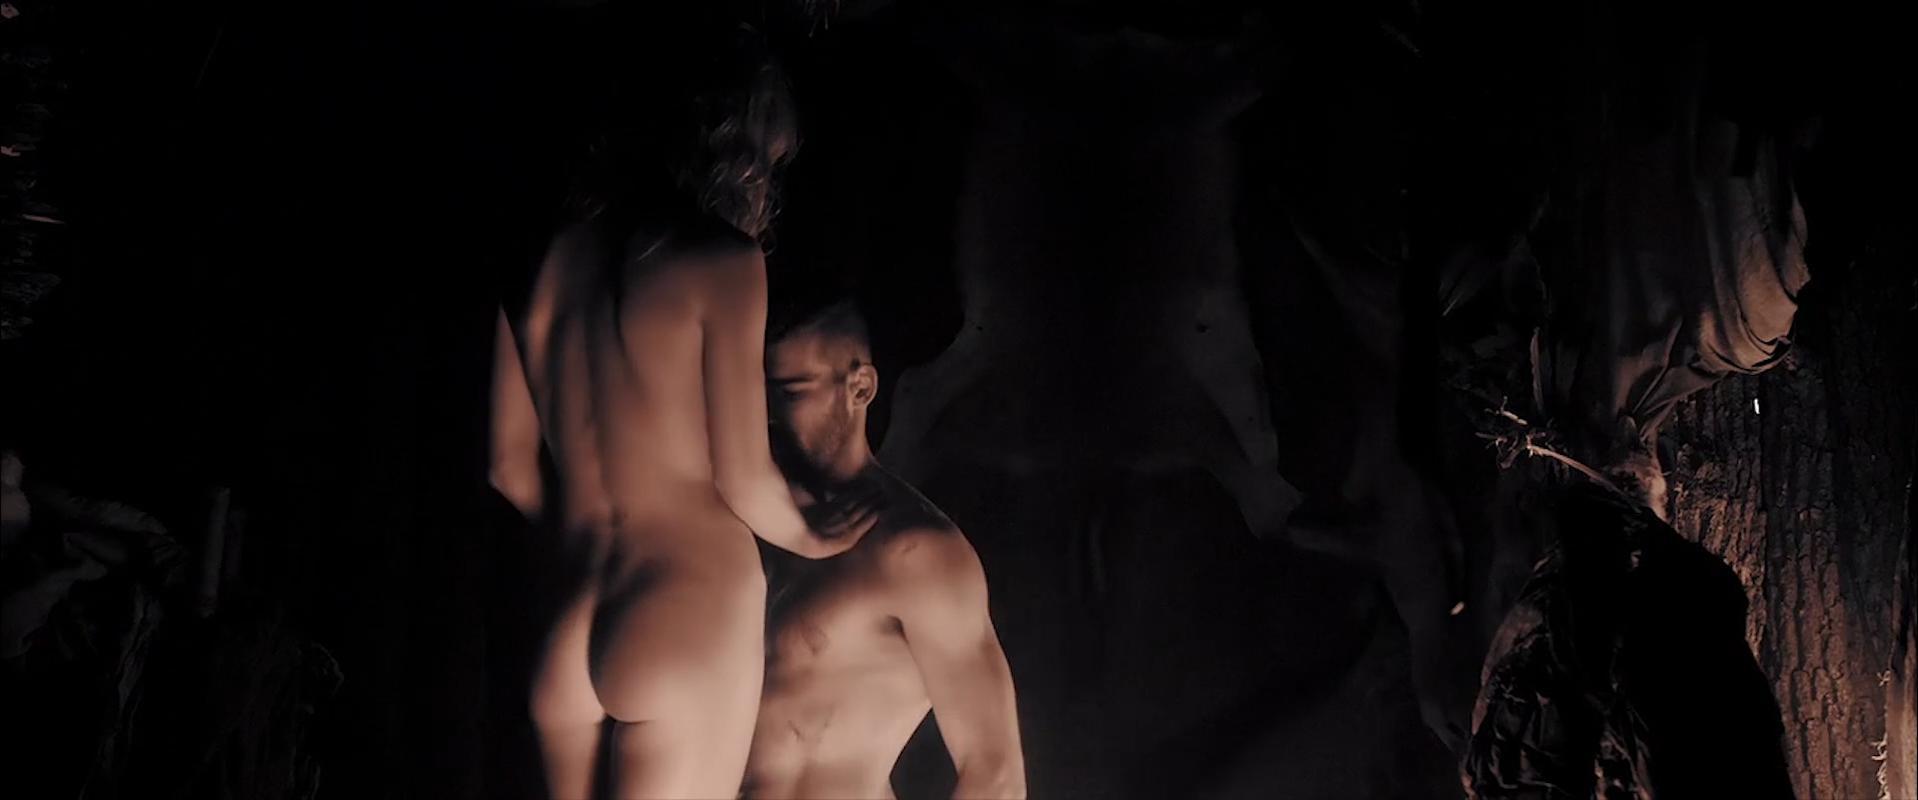 Annabelle Wallis nude - Sword of Vengeance (2015)